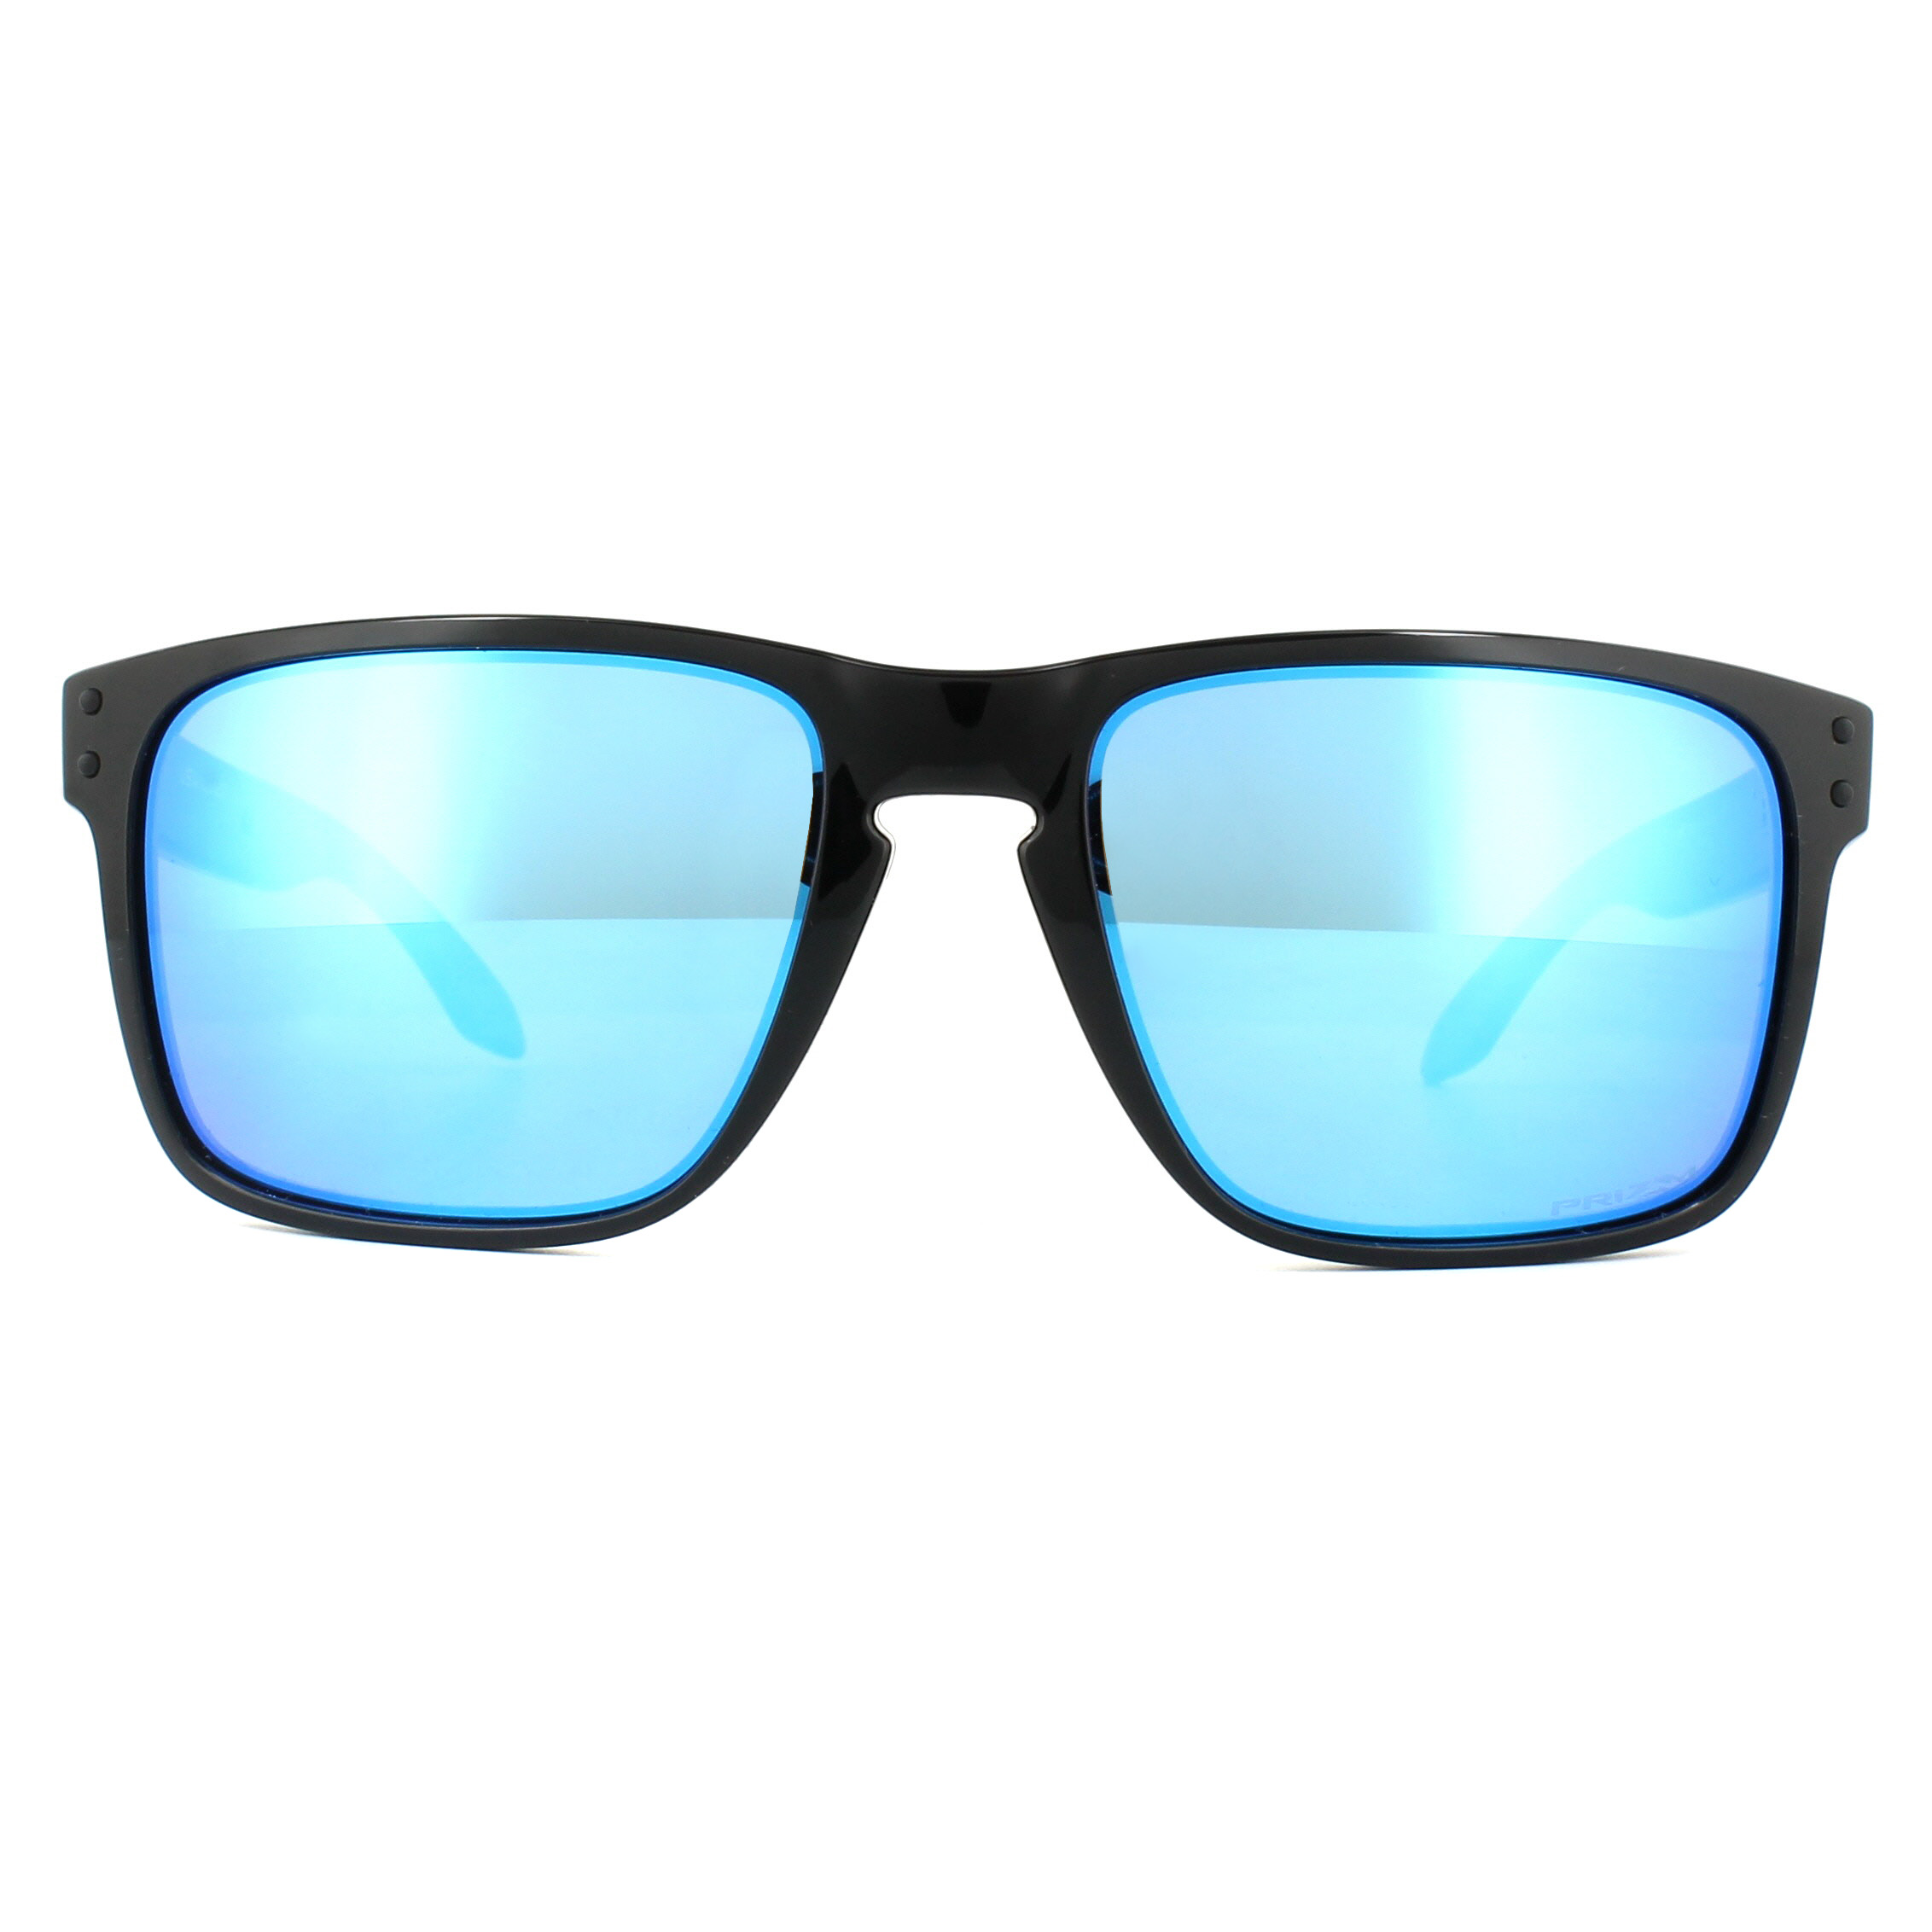 805fda1d96 Sentinel Oakley Sunglasses Holbrook XL OO9417-03 Polished Black Prizm  Sapphire